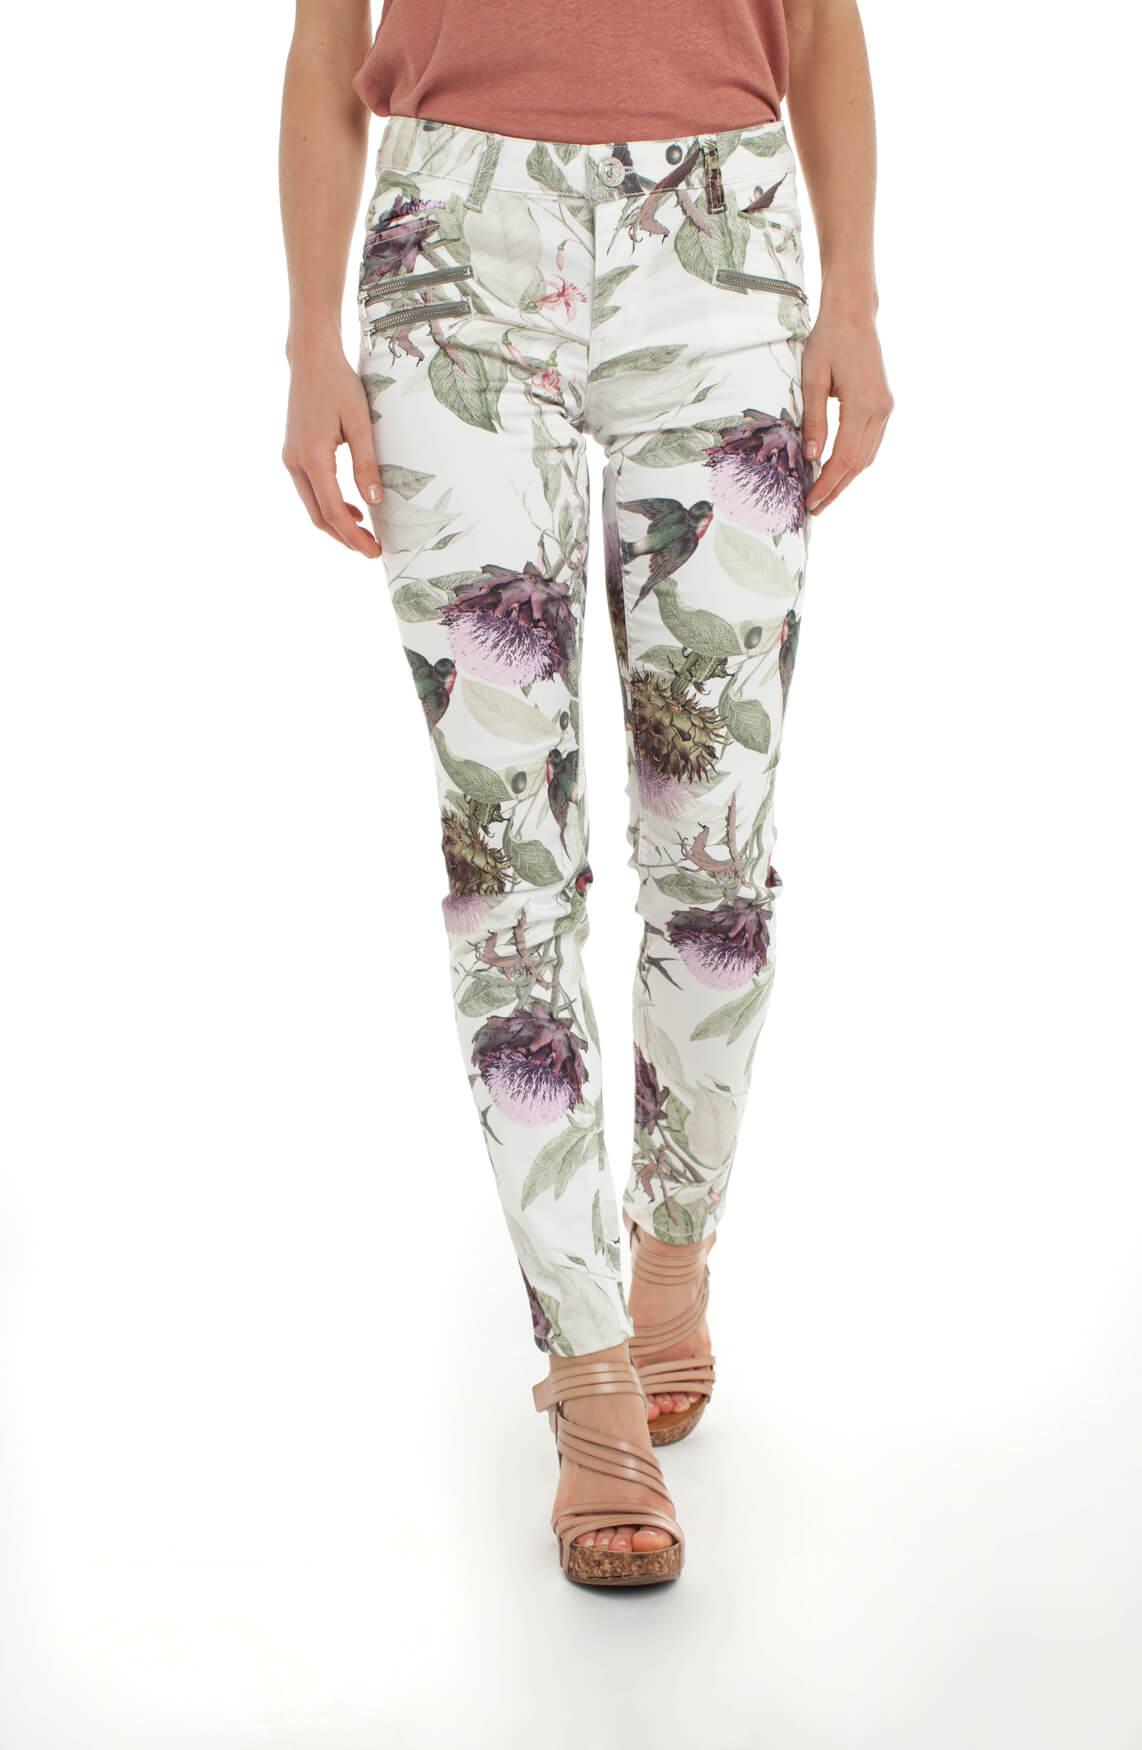 Mos Mosh Dames Berlin broek met bloemenprint wit